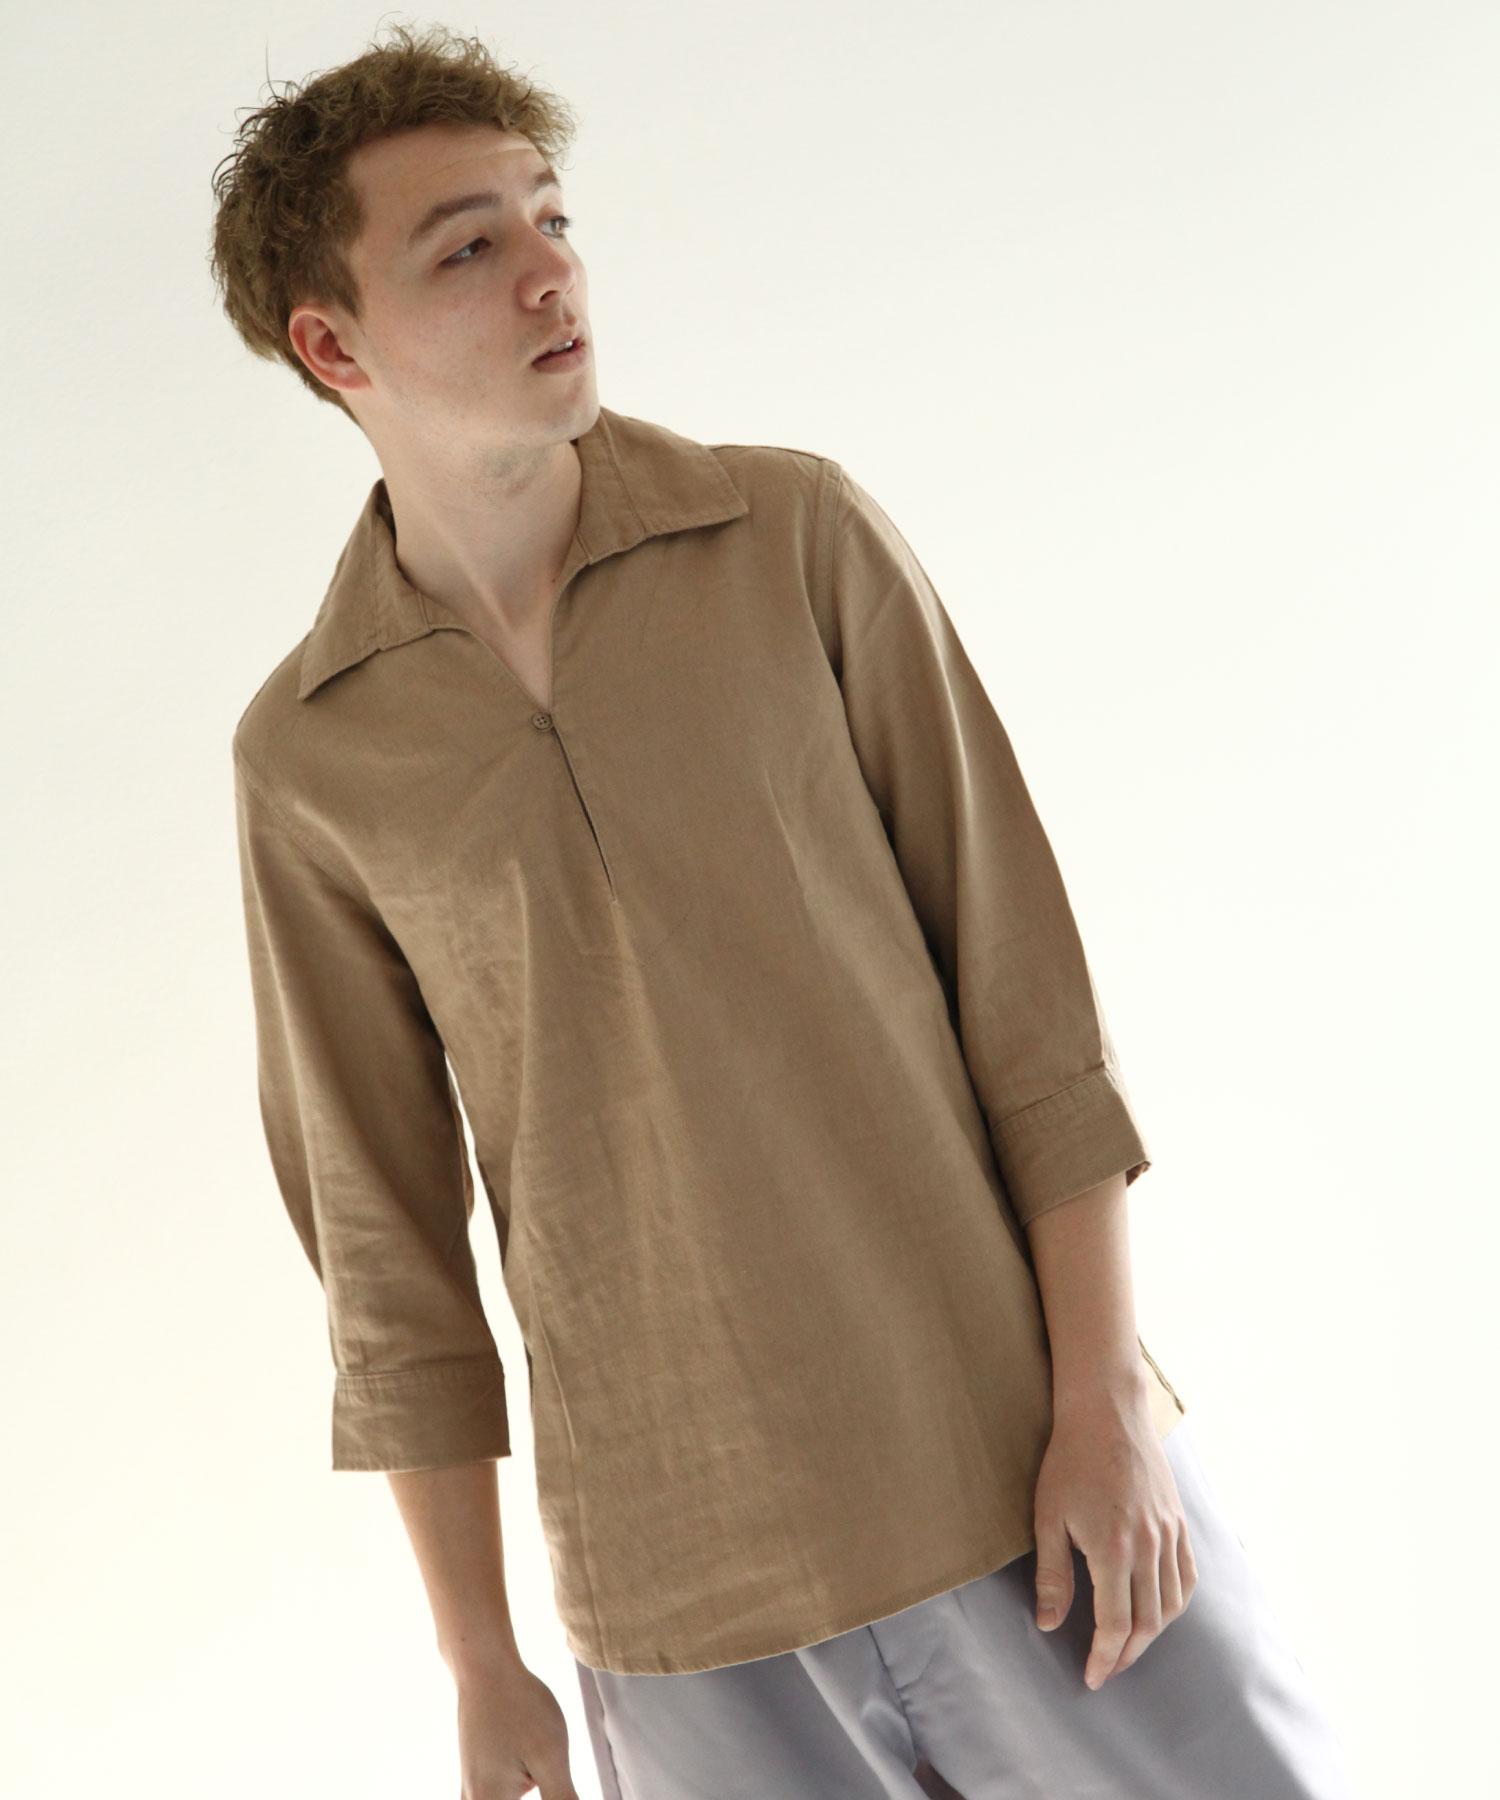 【Nilway】七分袖棉麻套頭衫 6